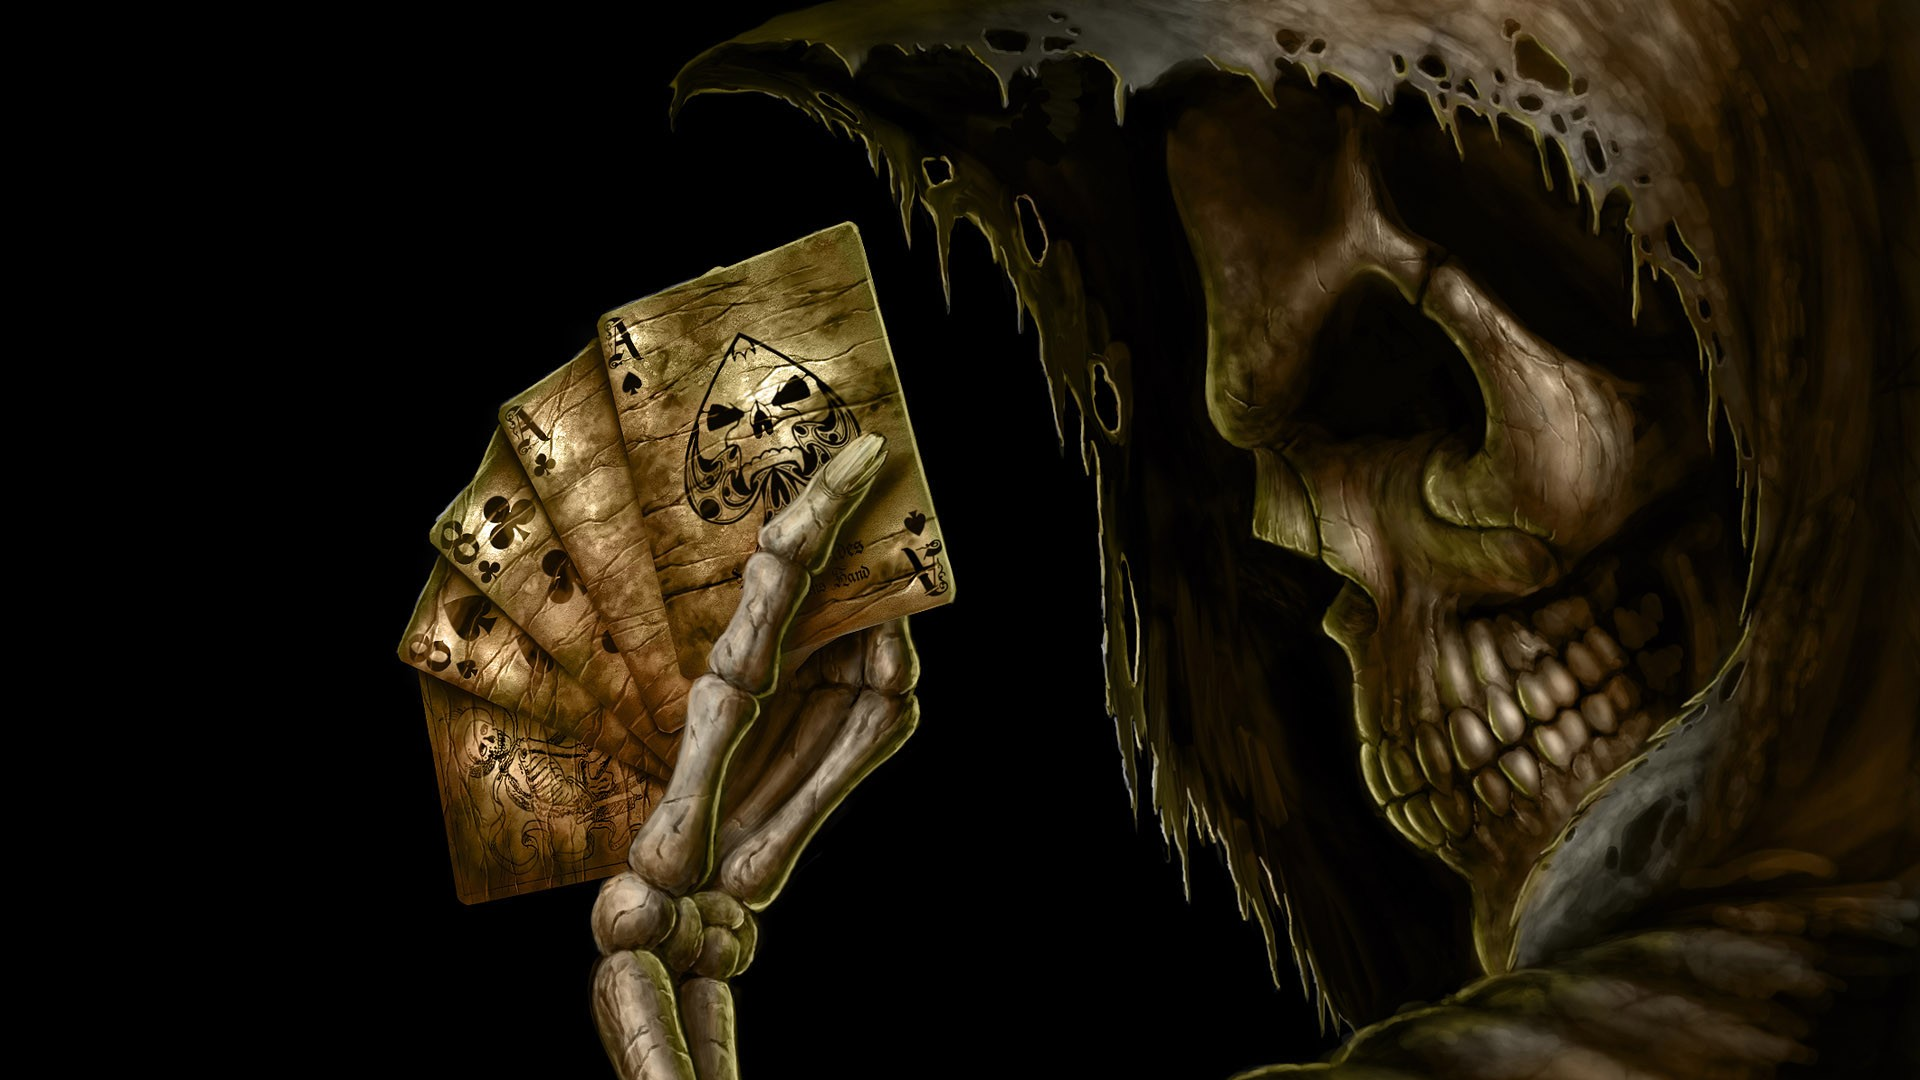 General 1920x1080 skull Grim Reaper cards black background skeleton poker death fantasy art cape simple background profile Ace of Spades spades aces playing portrait